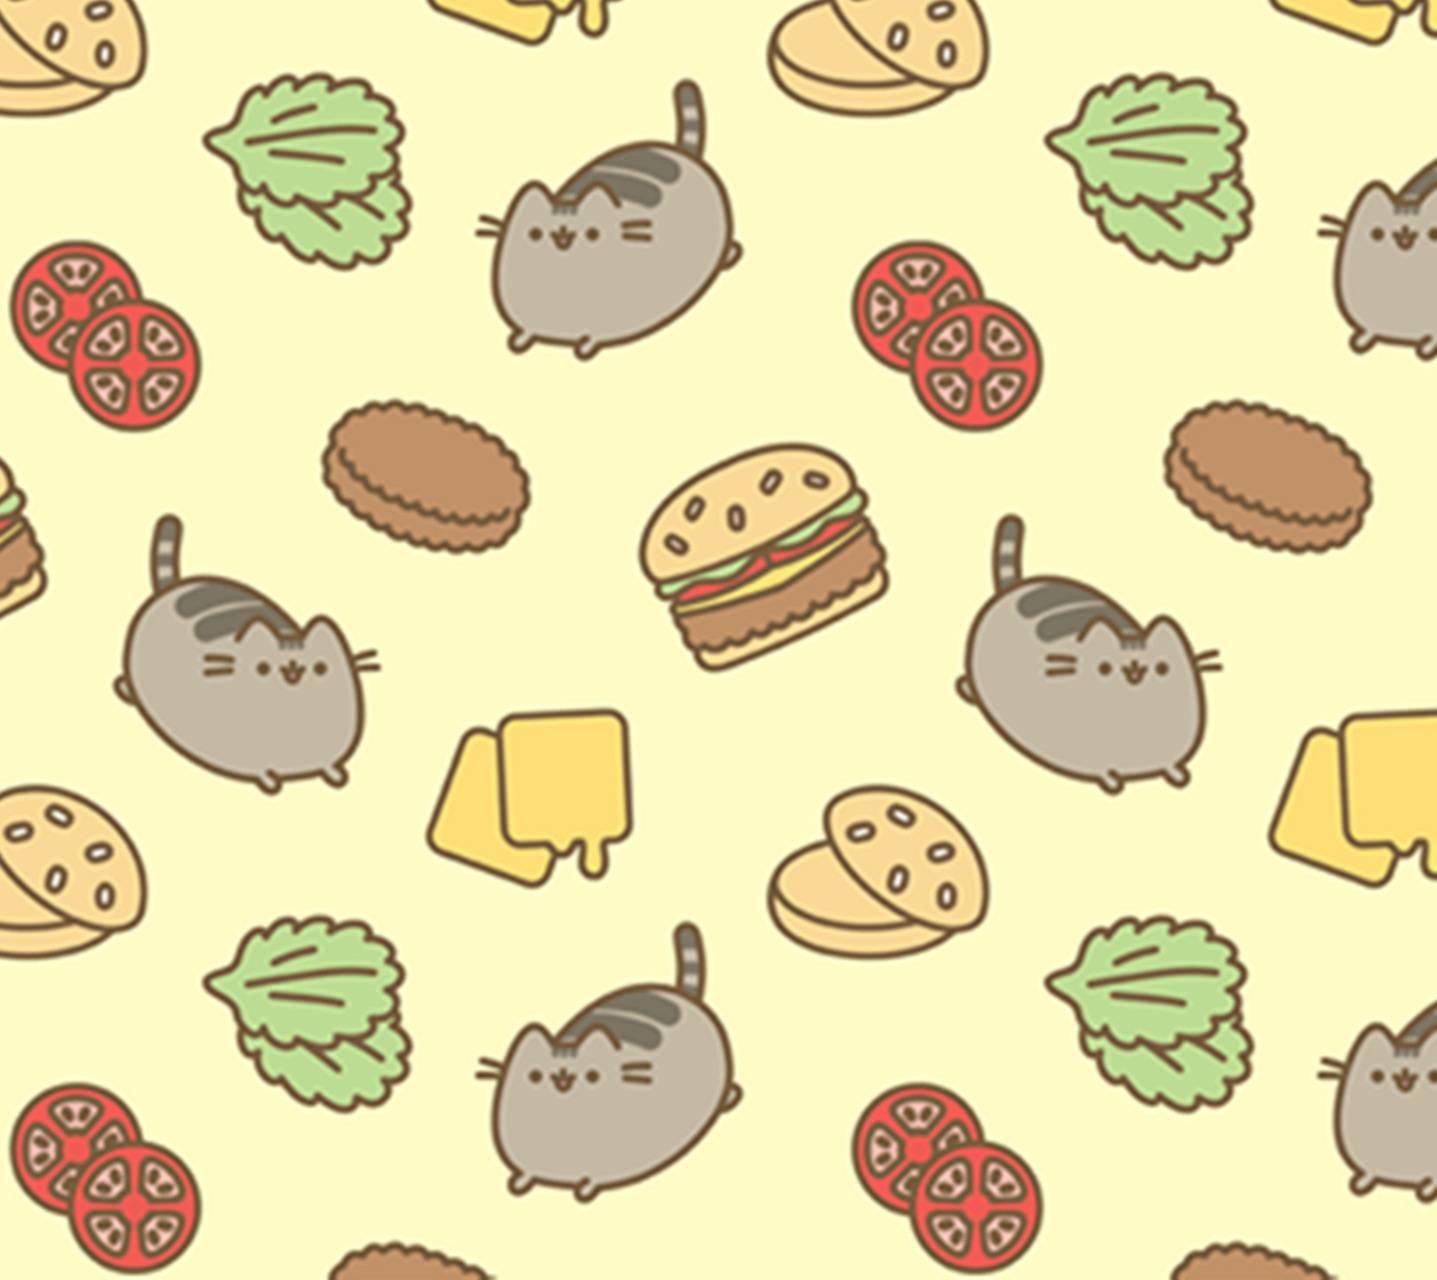 meowburger